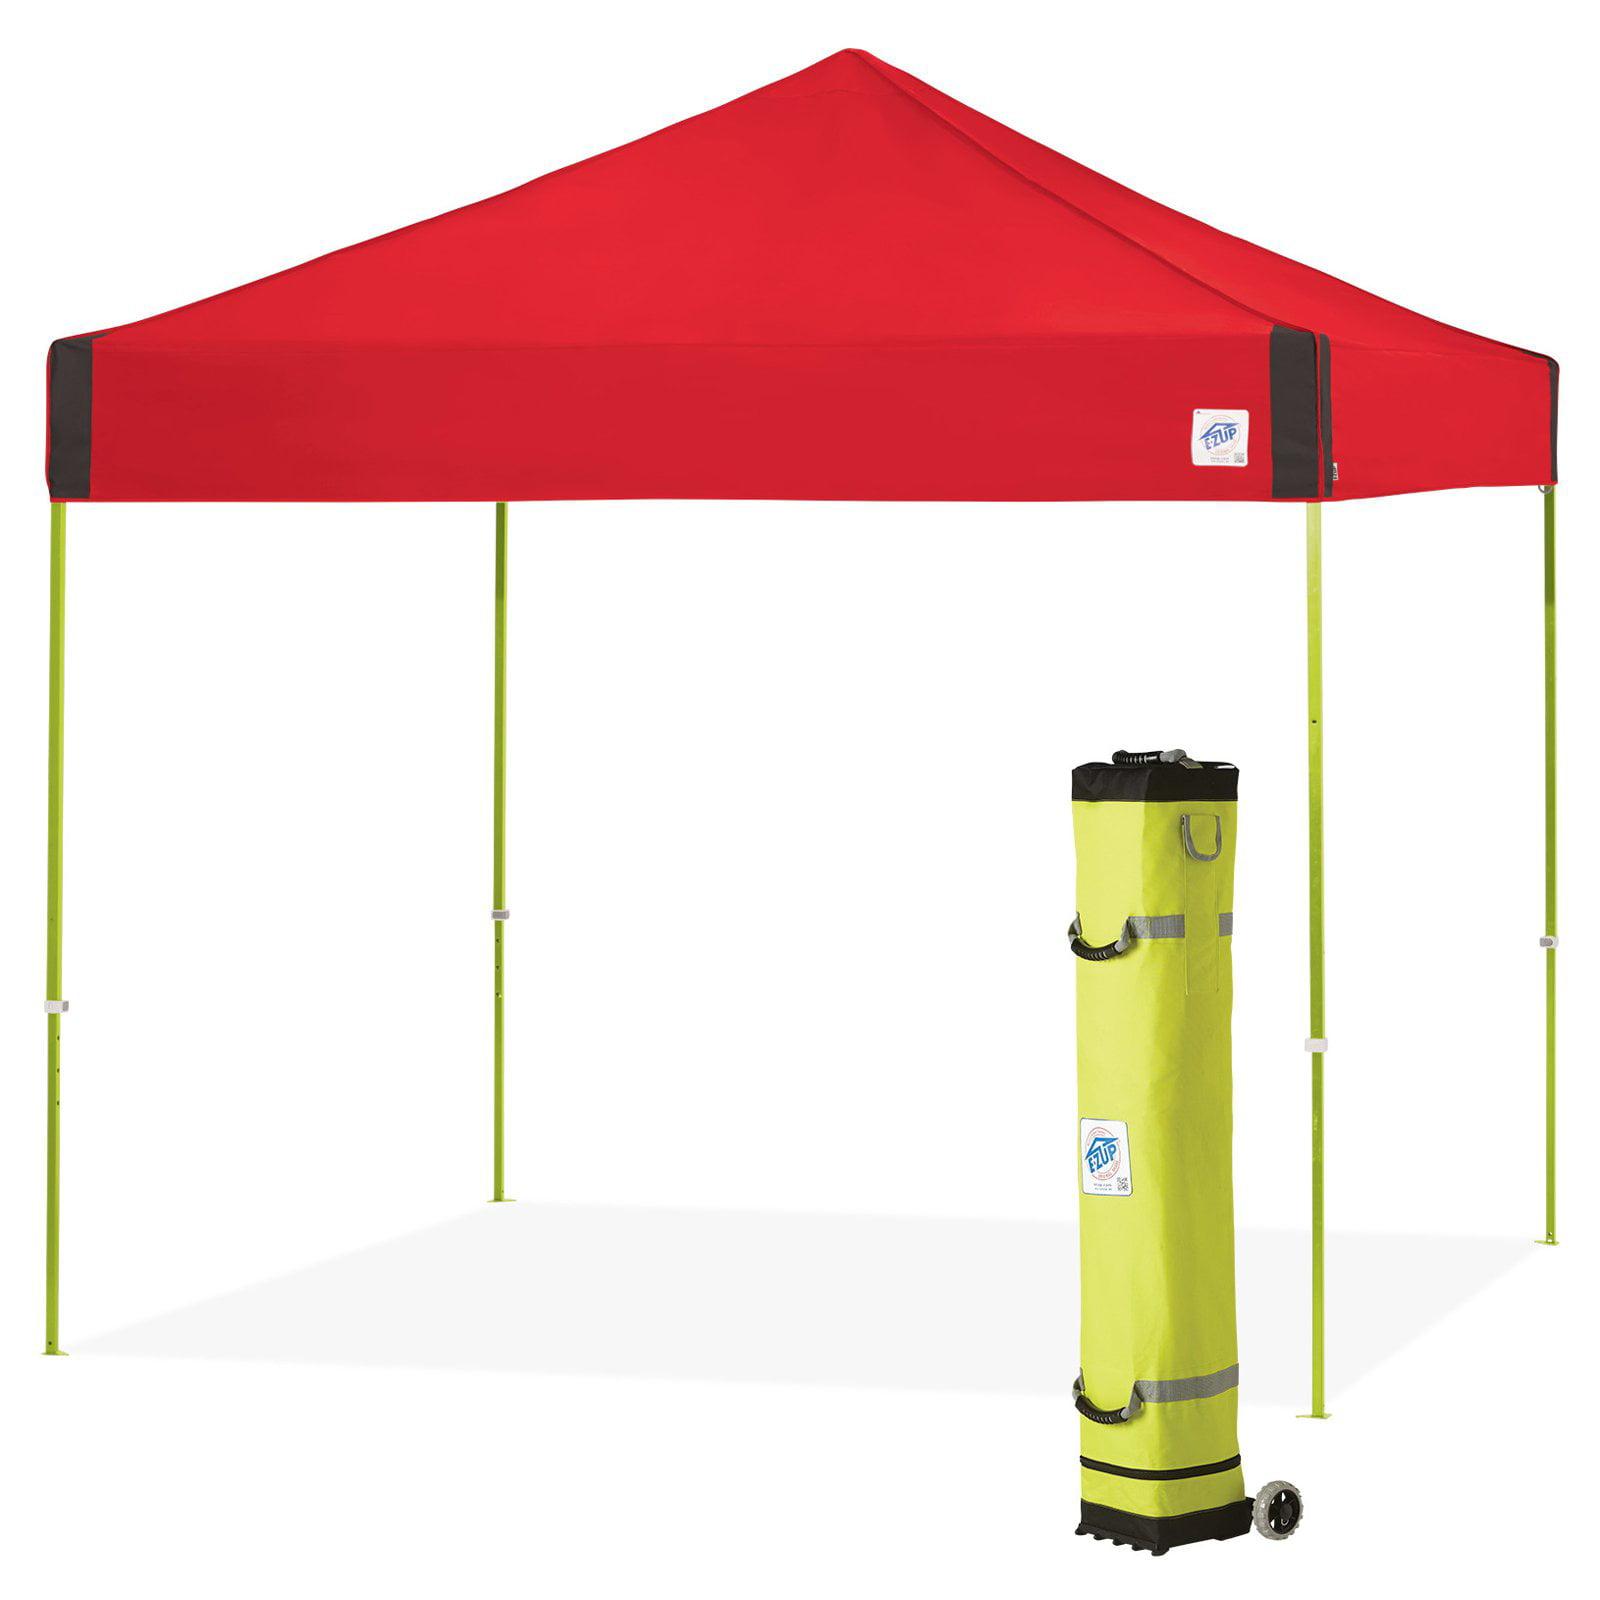 uk availability 233ee 8a07a E-Z UP® Pyramid 10x10 ft. Canopy